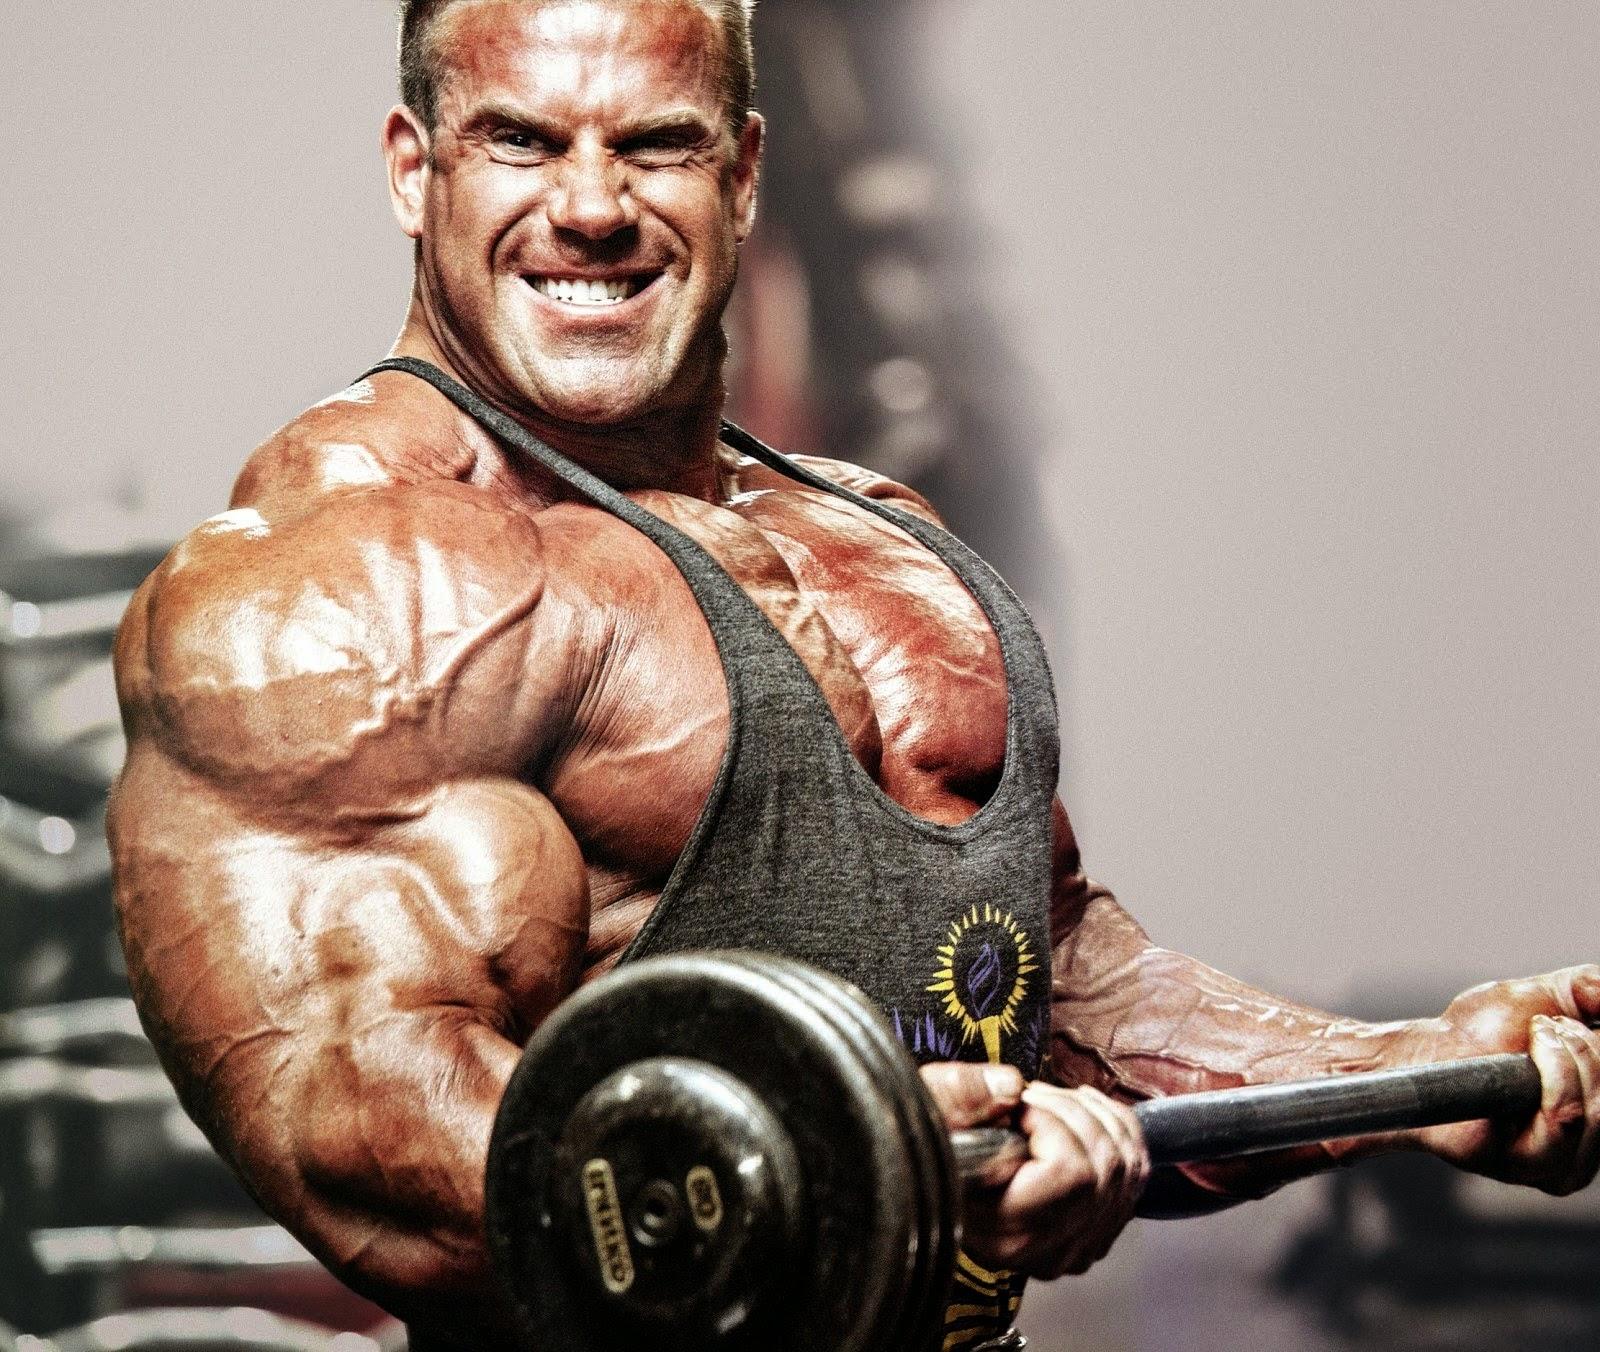 Jay Cutler Arms Workout Jay Cutler Workout